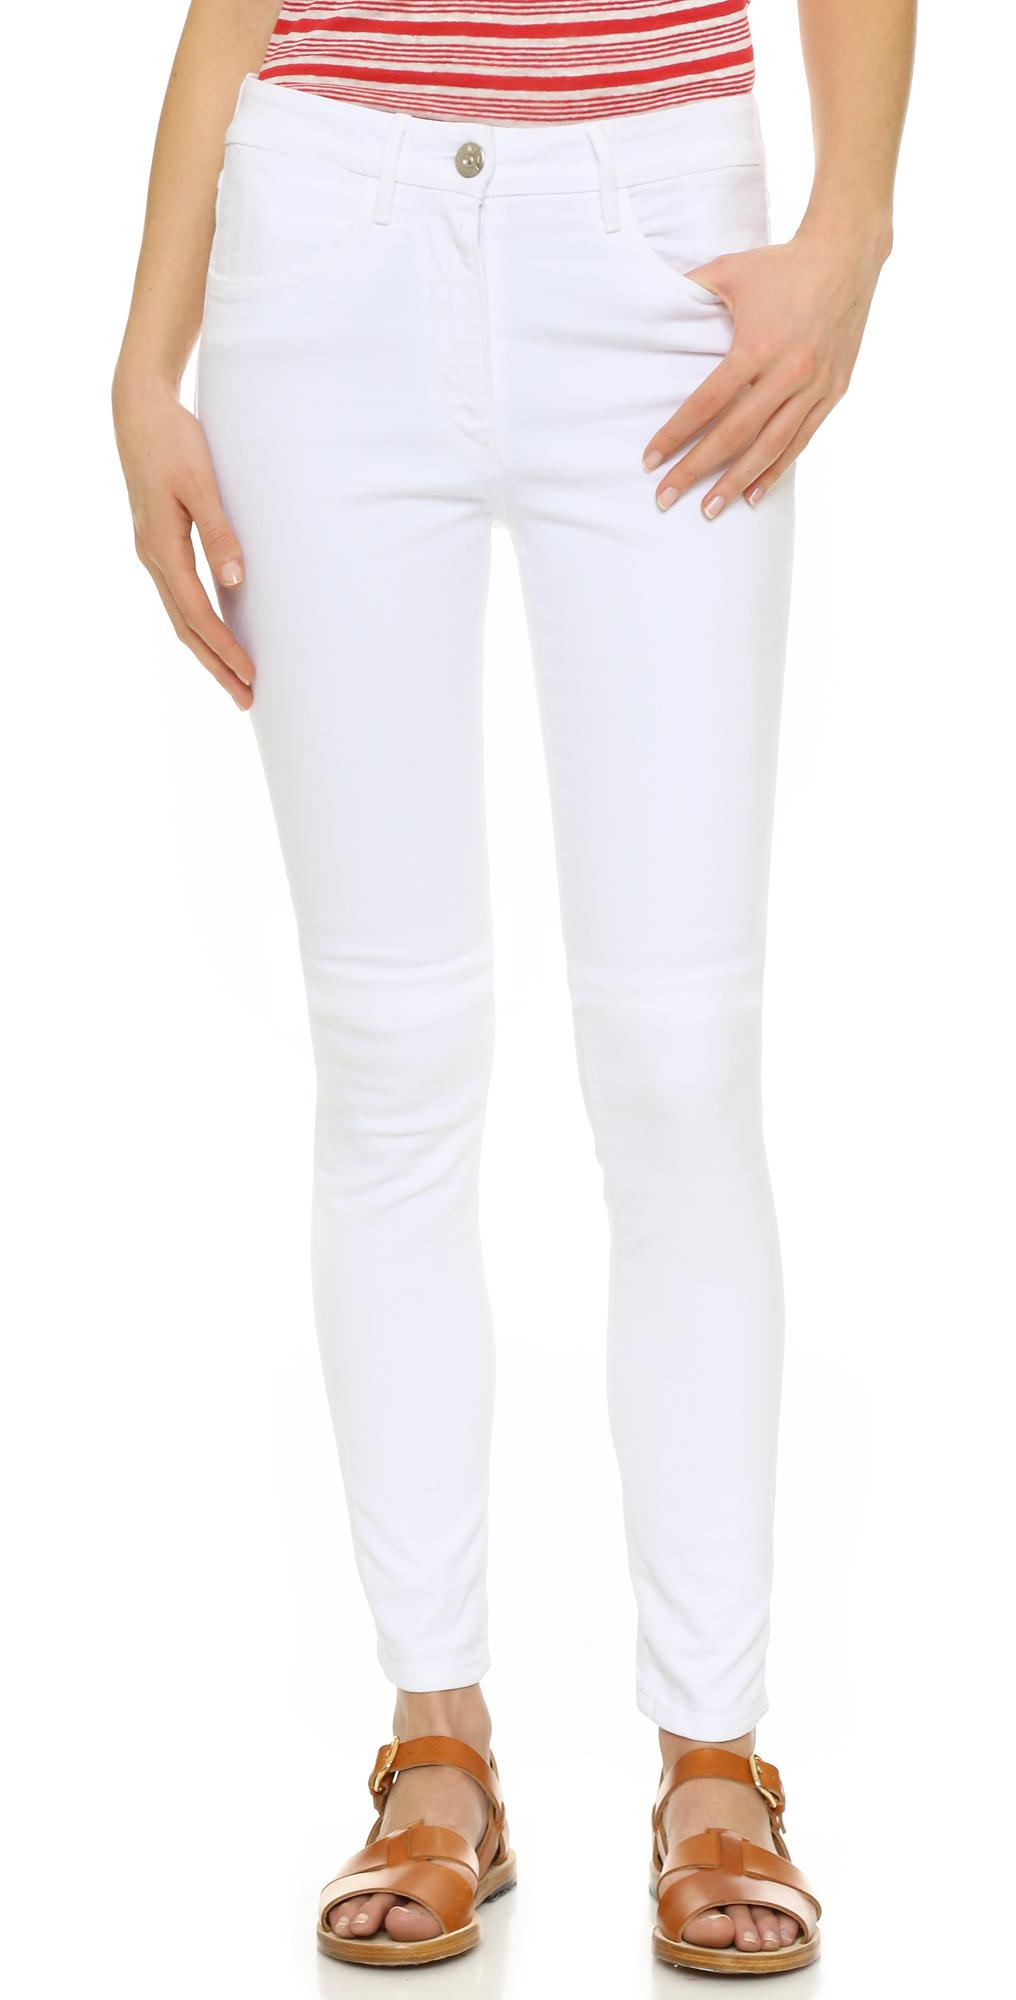 W3 High Rise Channel Seam Skinny Jeans 3x1